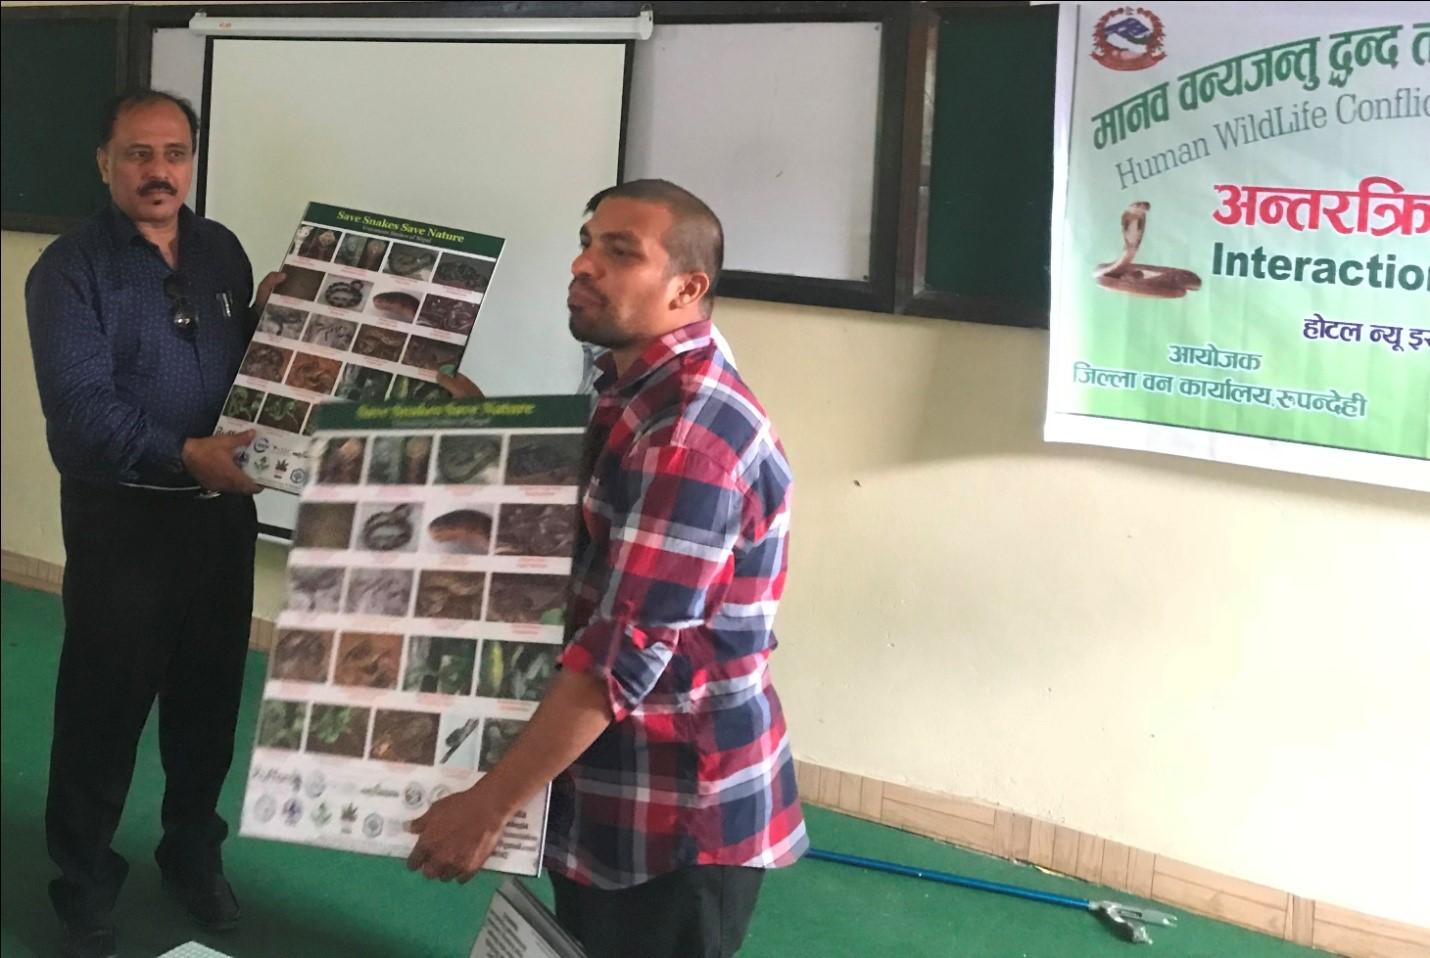 Romraj Lamichhane, District Forest Officer (DFO), Rupandehi, being handed over Five Mounted Laminated Framed Poster at the district level workshop.